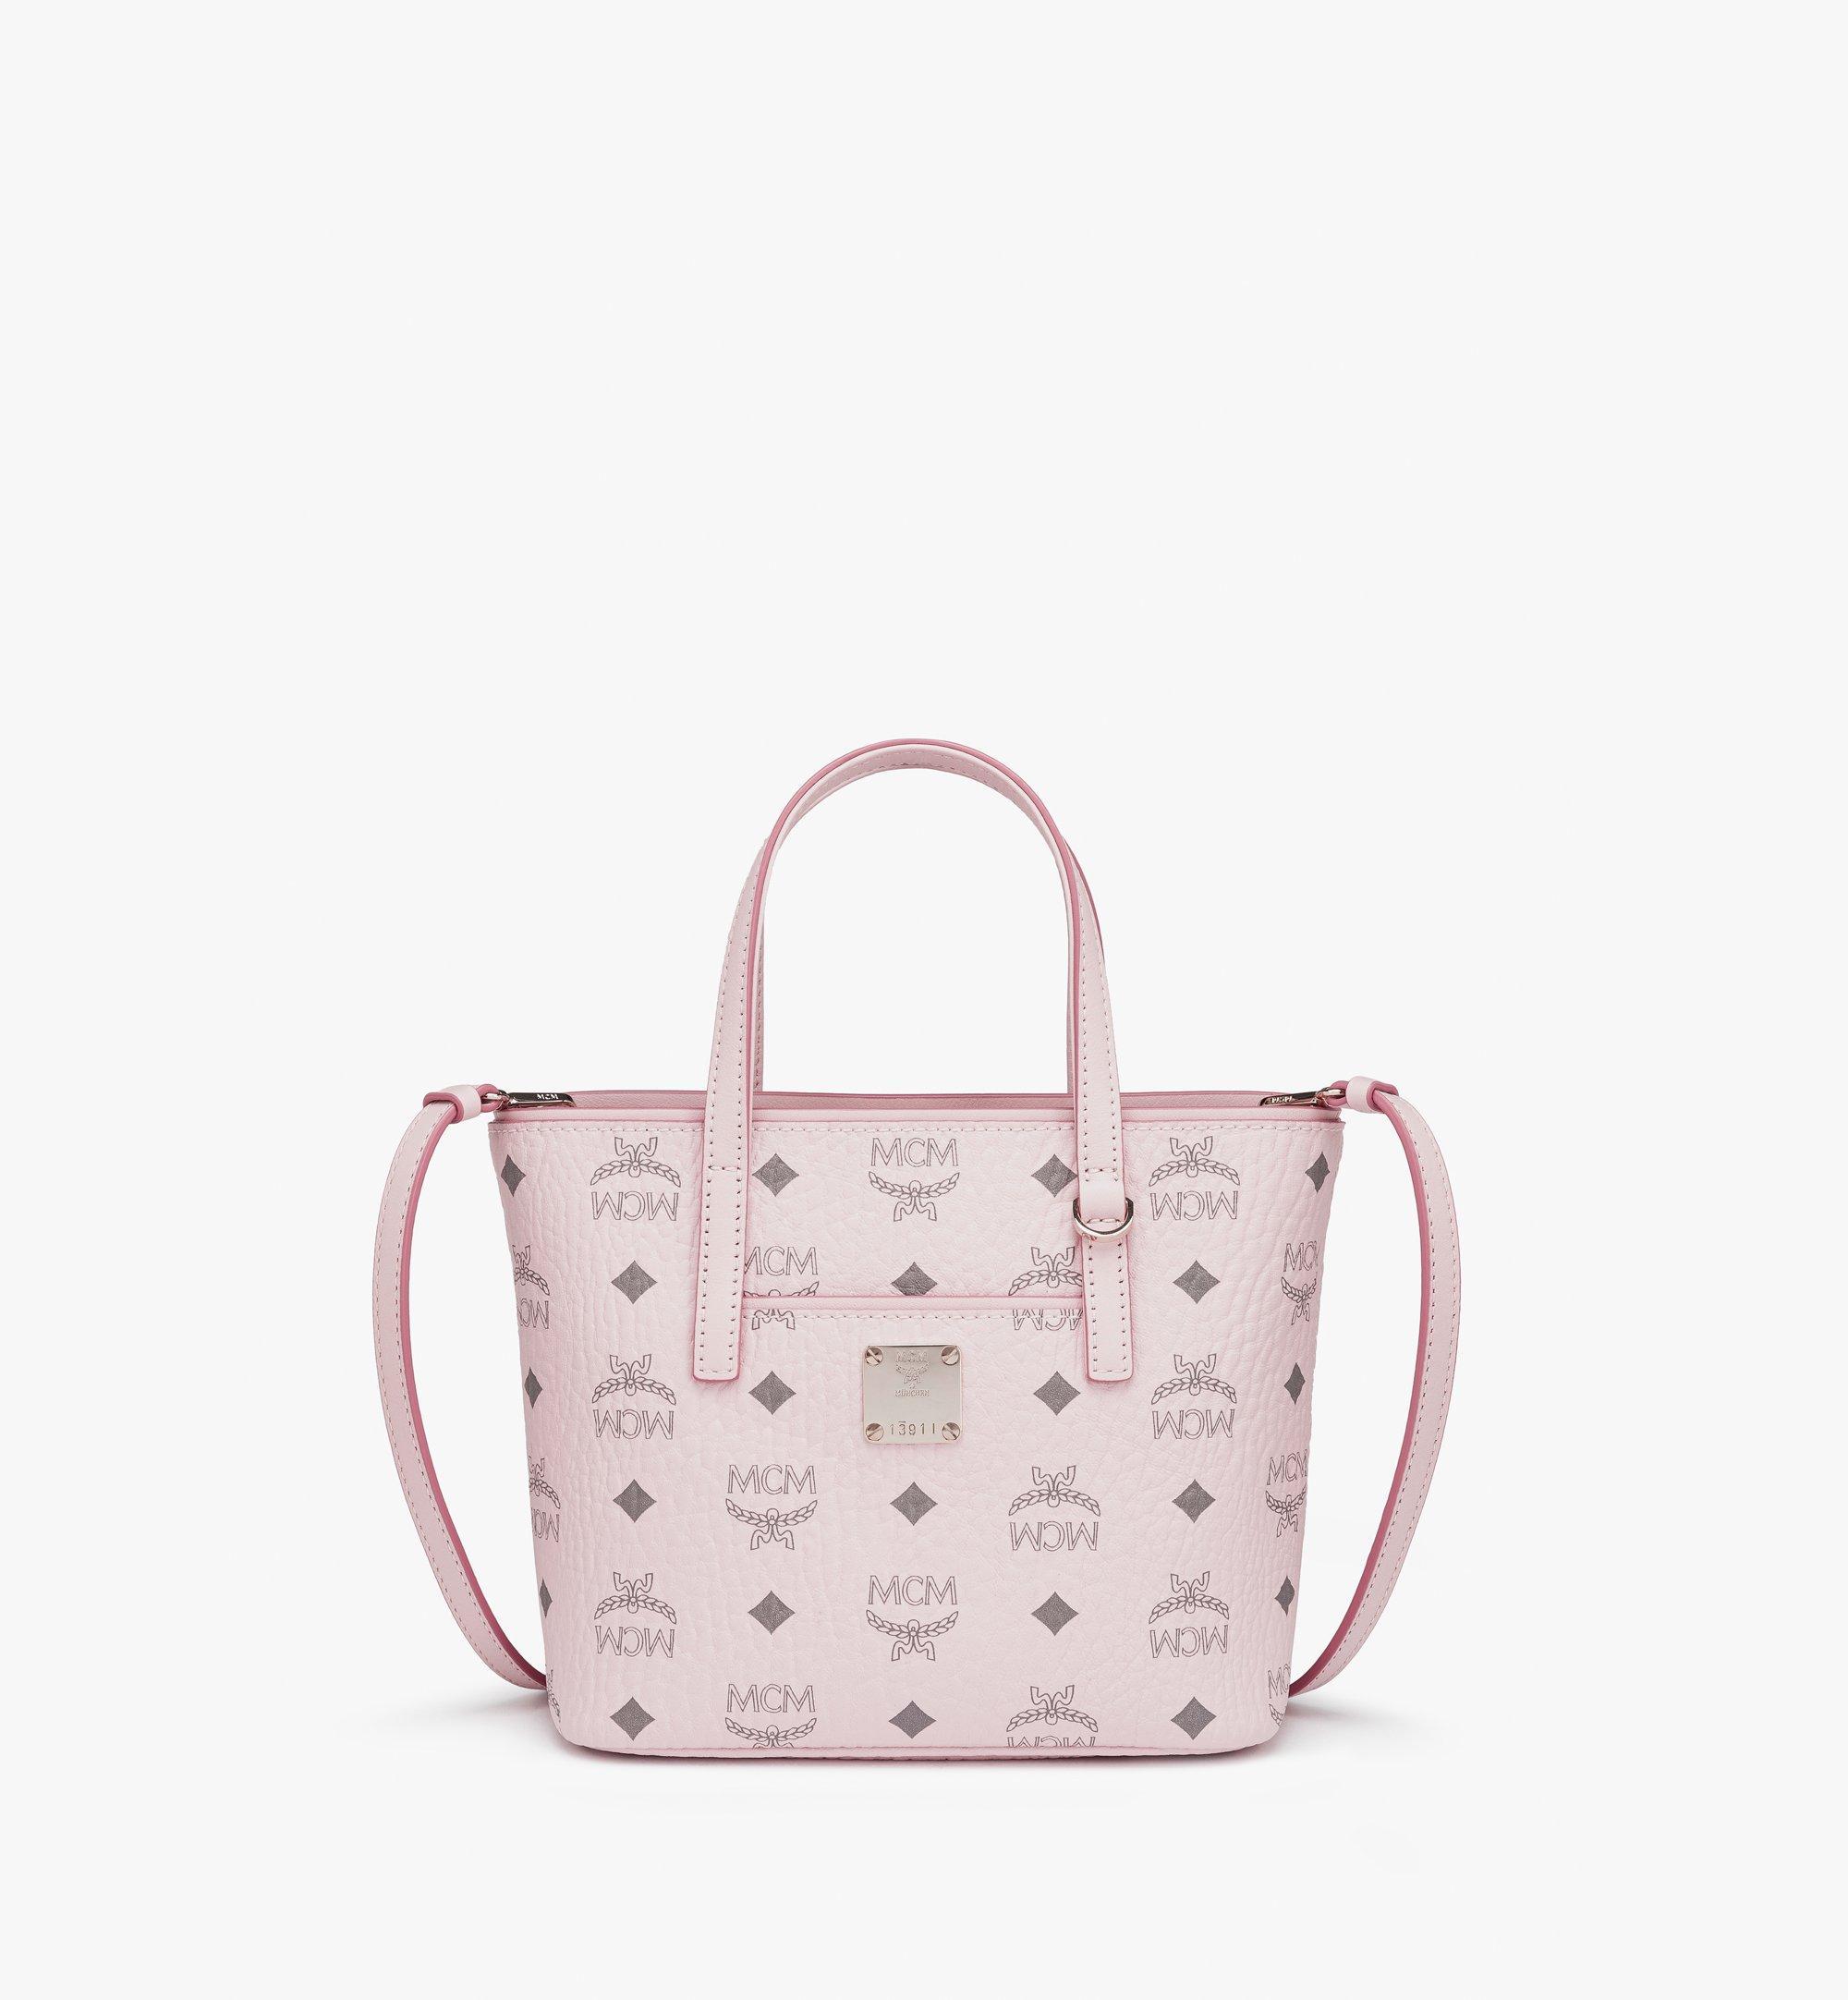 Mini Anya Shopper in Visetos Powder Pink   MCM® DE